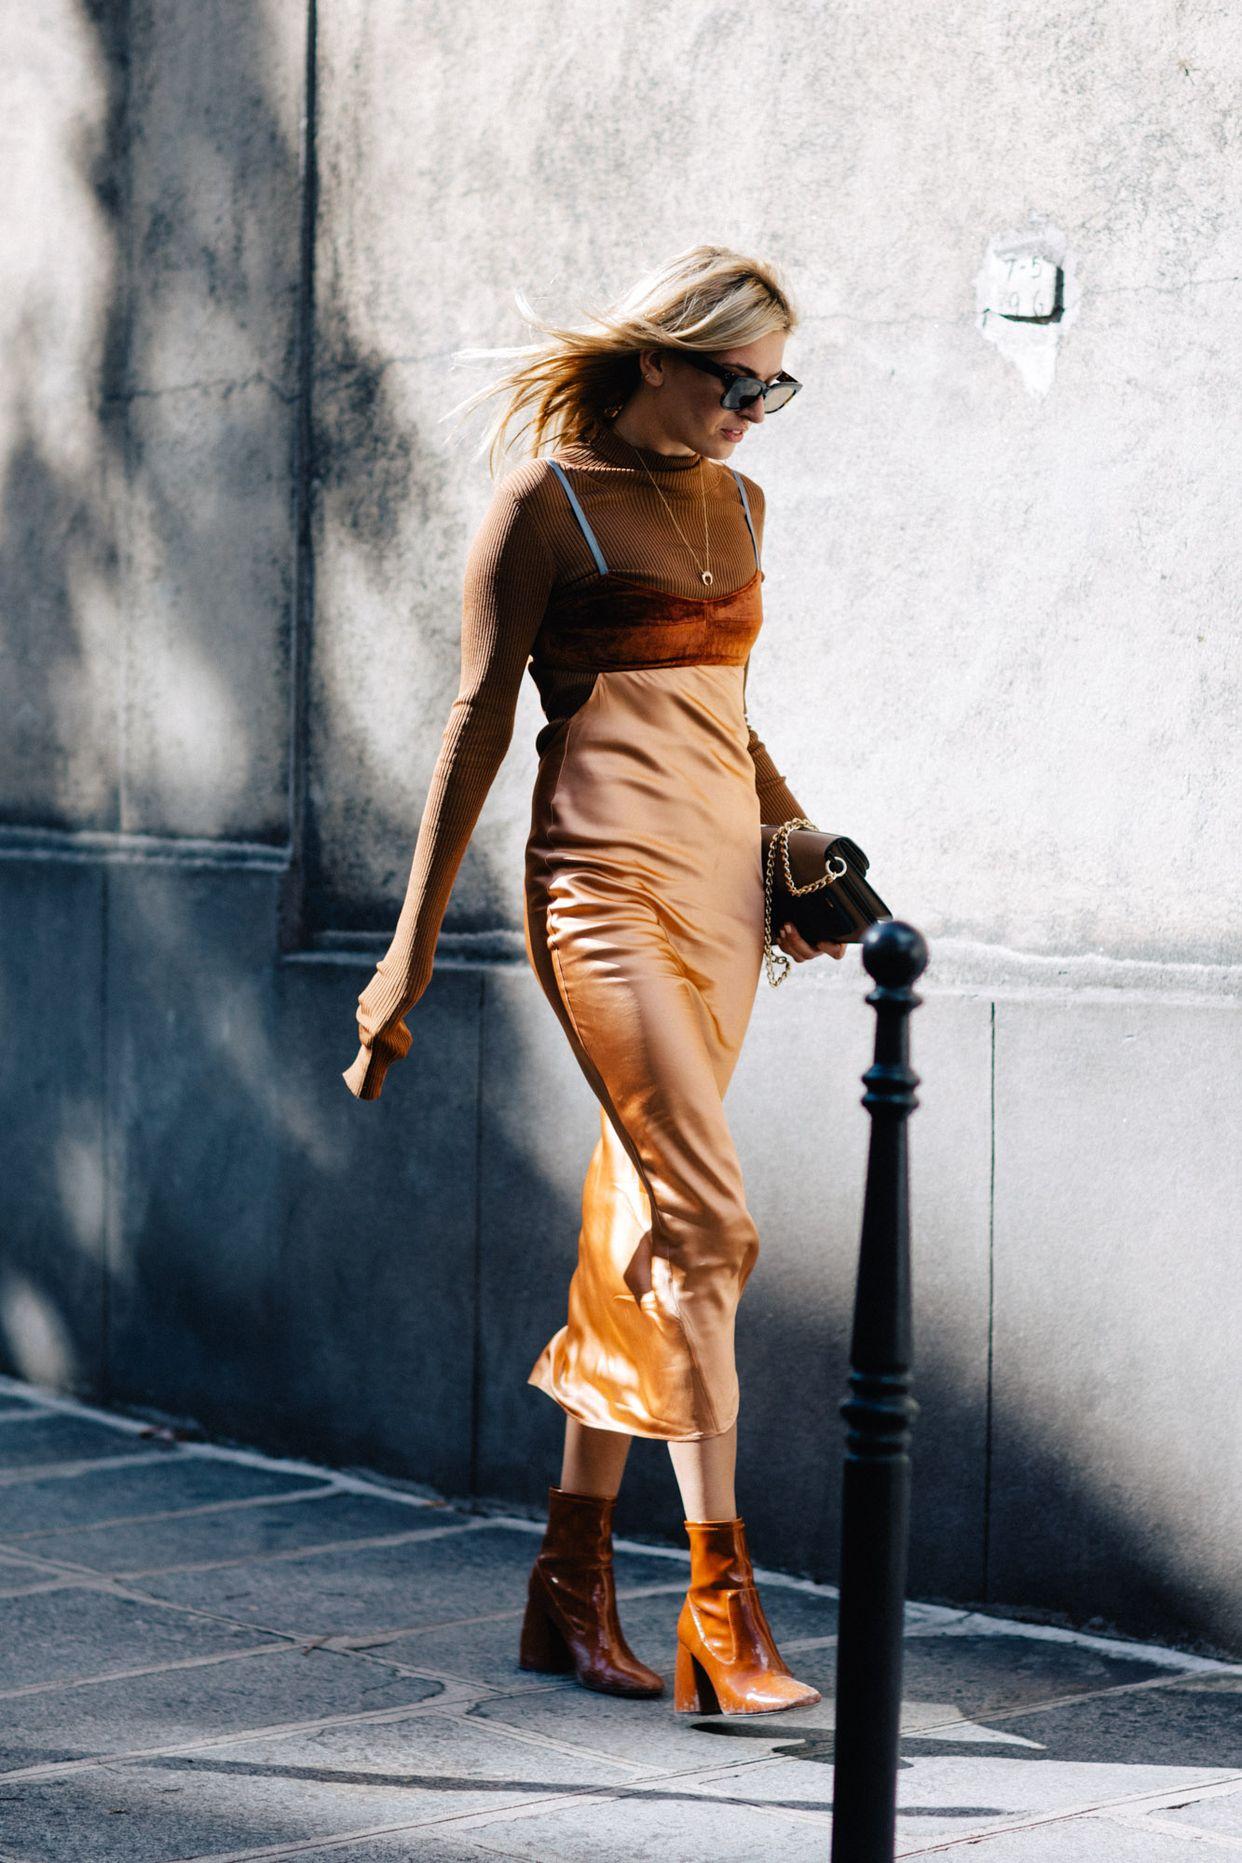 7-vestido-lencero-looks-invierno